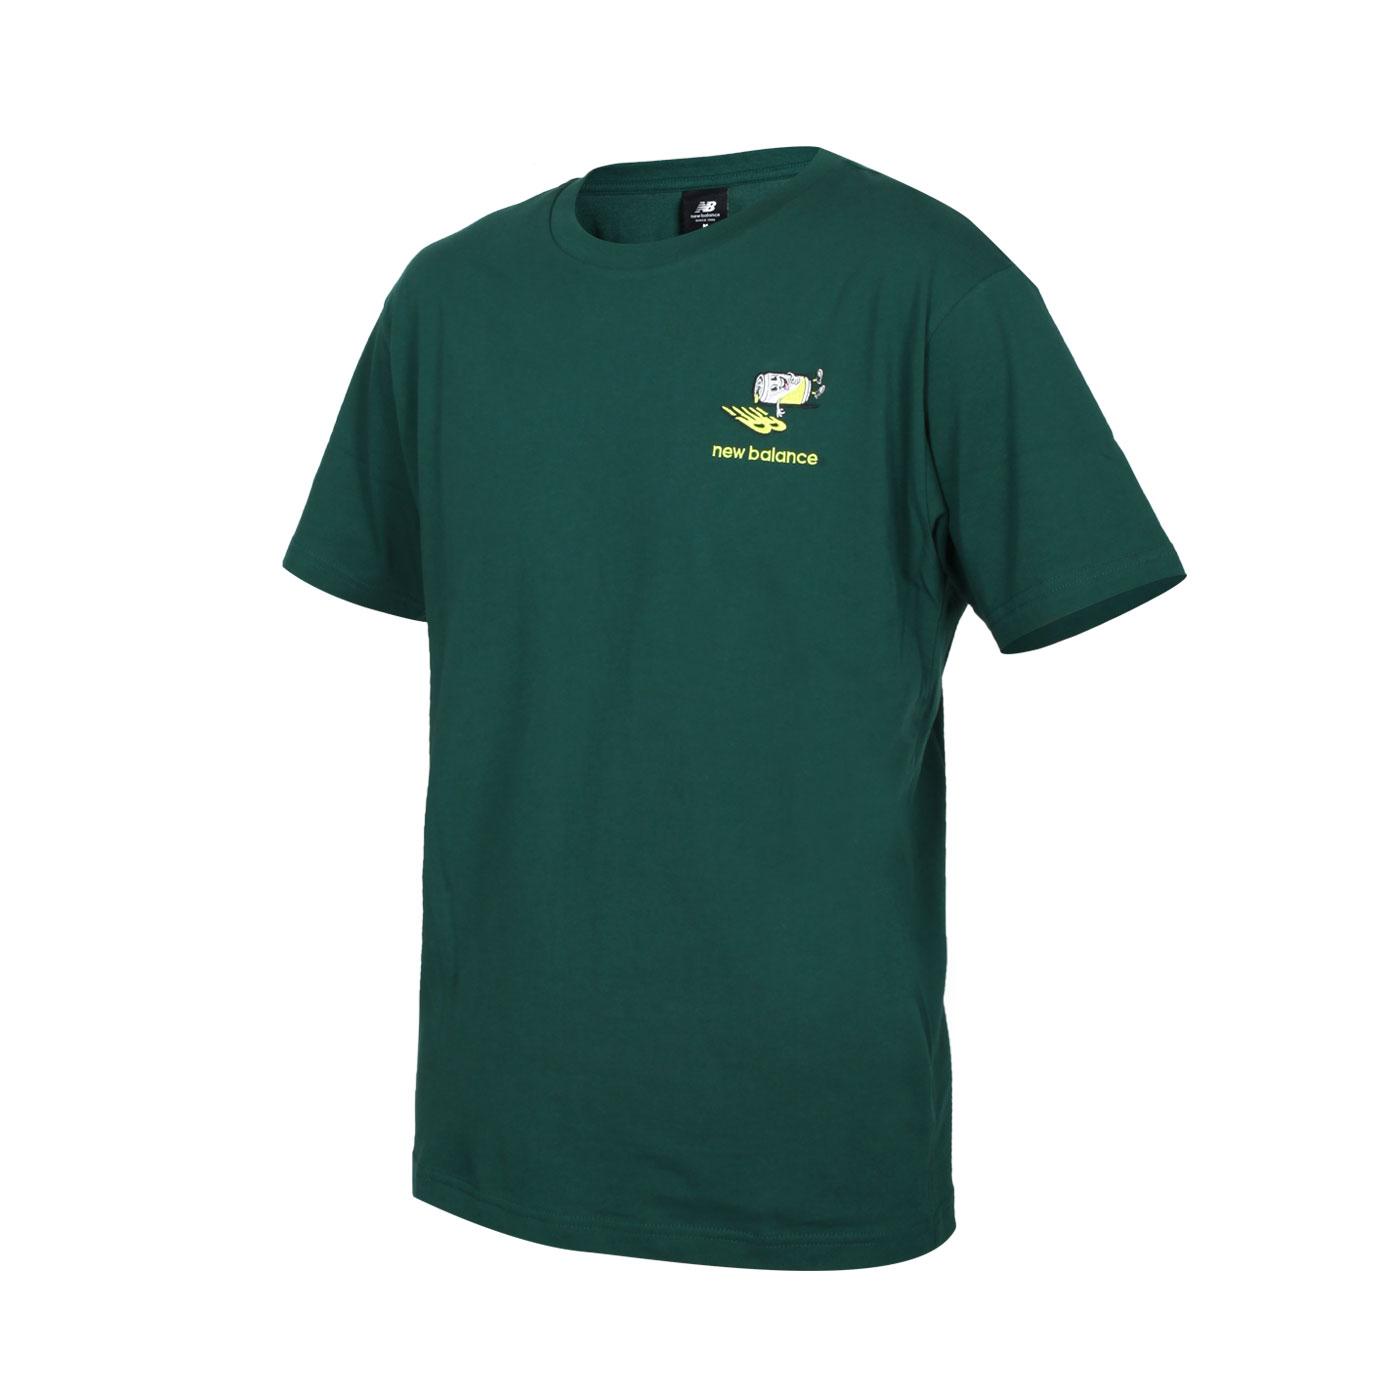 NEW BALANCE 男款短袖T恤 AMT13573NWG - 深綠螢光綠